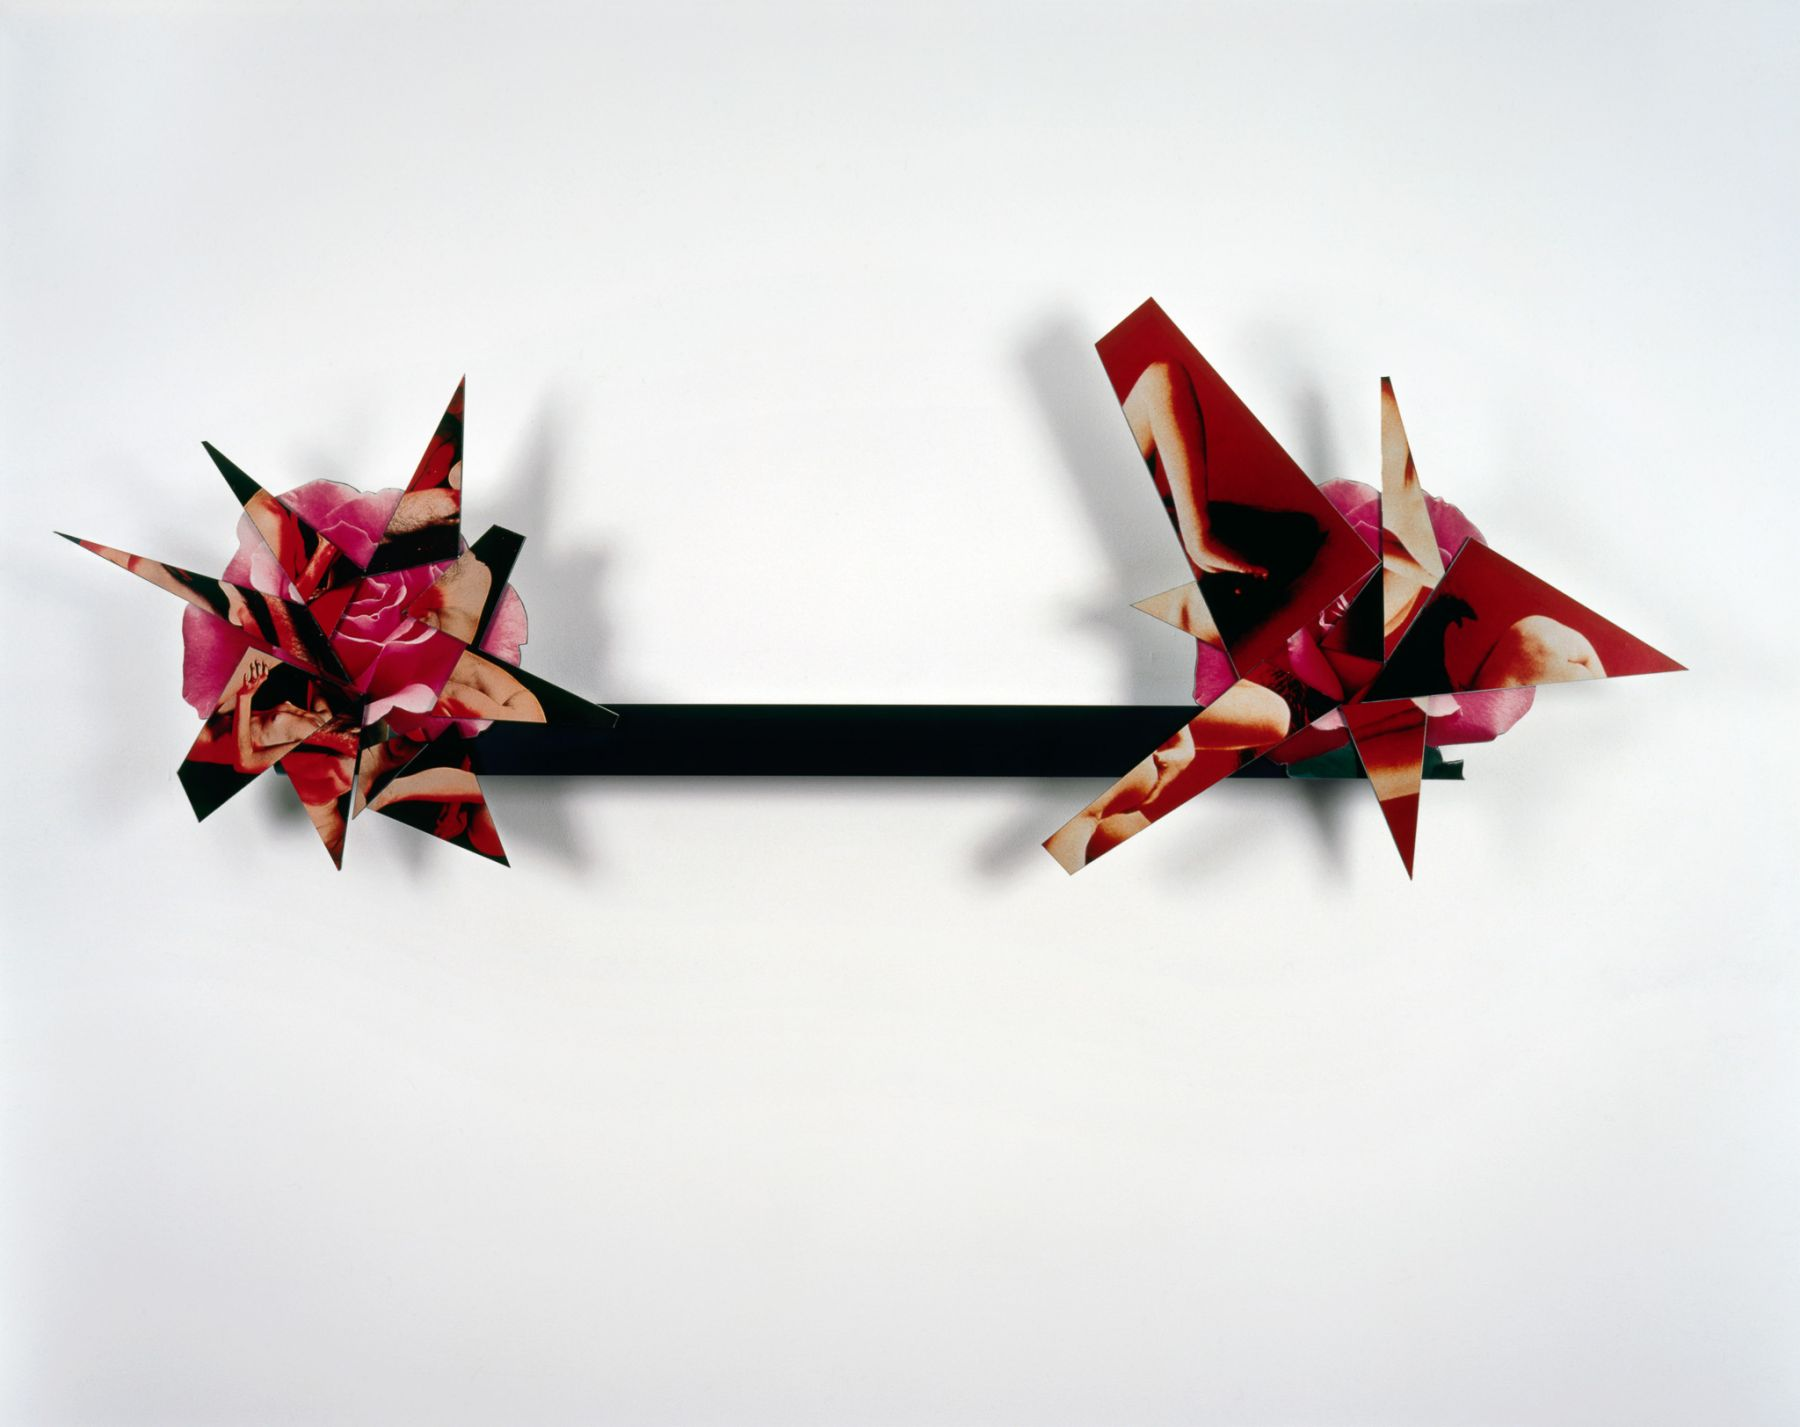 Anne Doran, Deniability, 1991